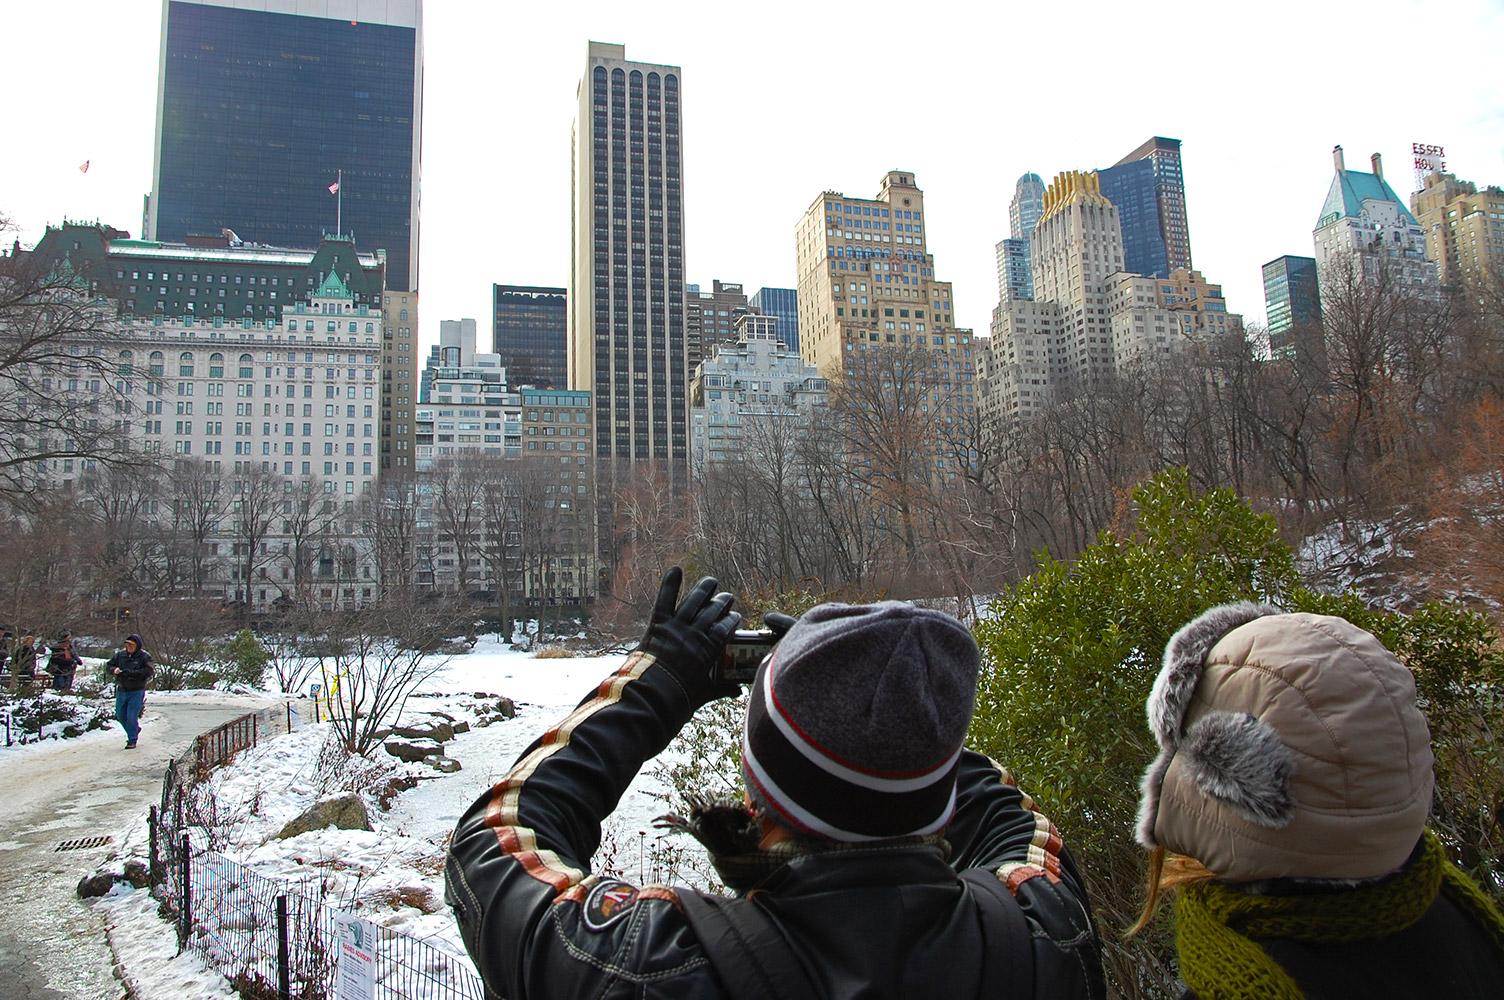 חורף בניו יורק (צילום: xplorer)